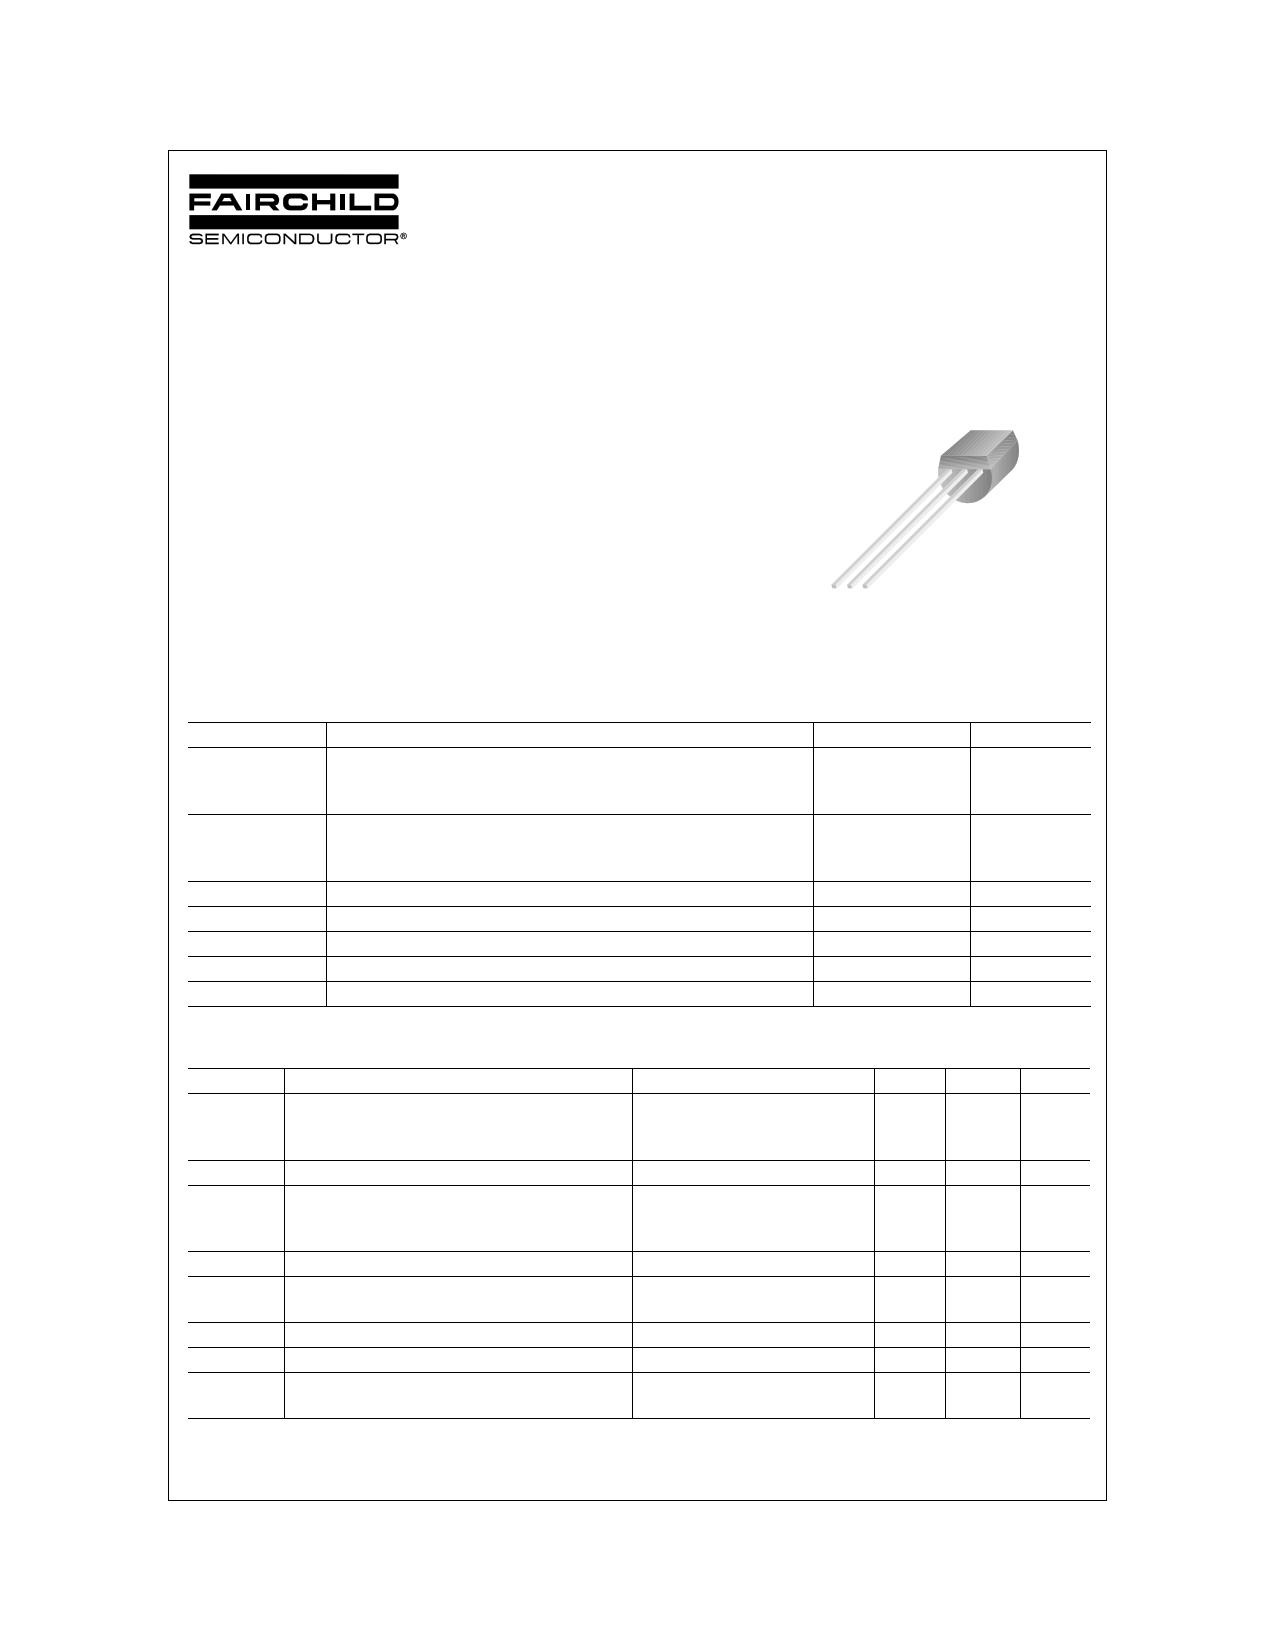 KSP05 datasheet